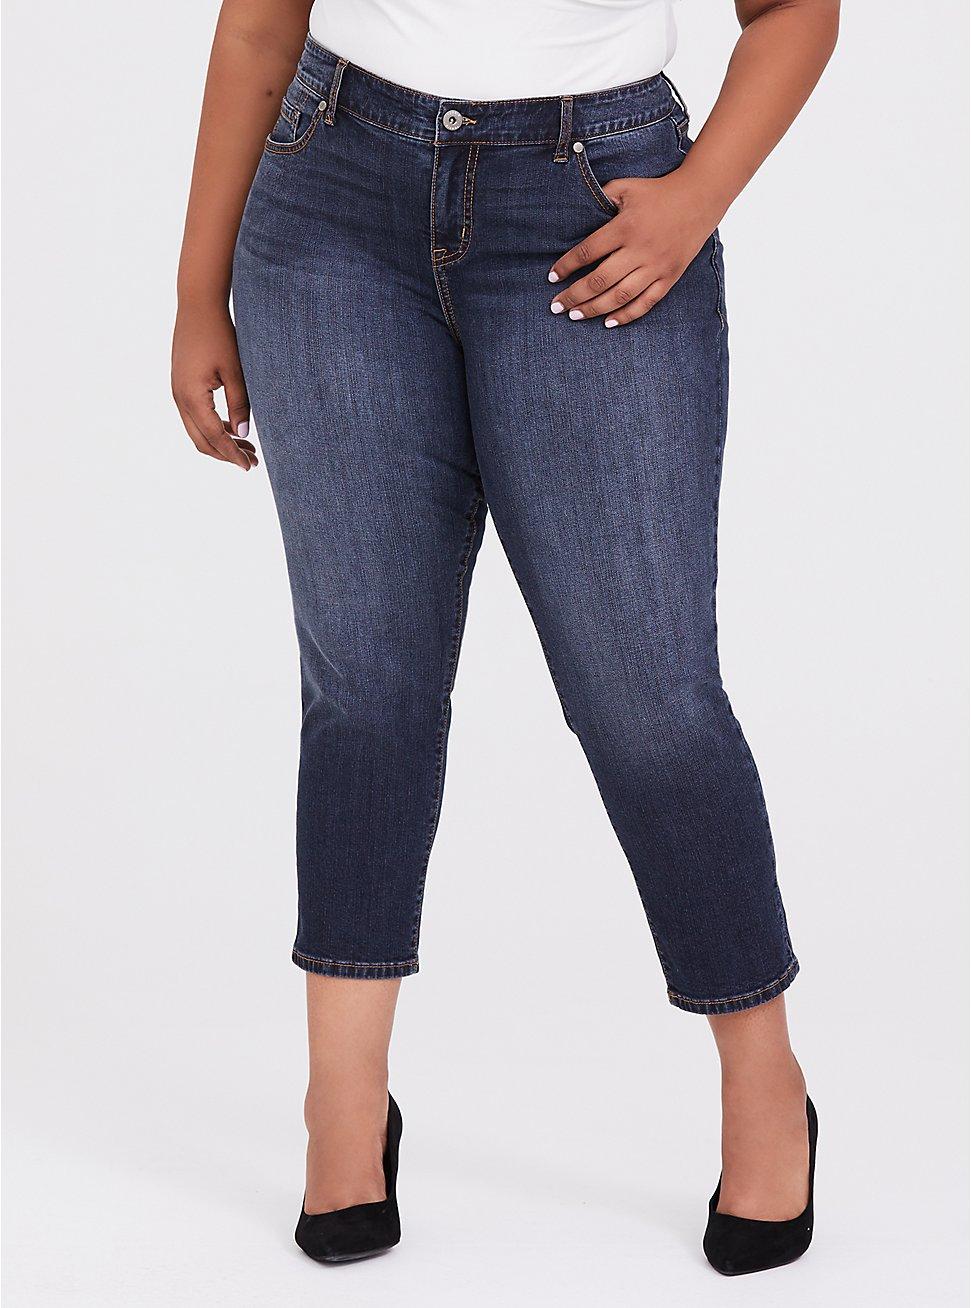 Mid Rise Straight Jean - Vintage Stretch Dark Wash, MAUI, hi-res